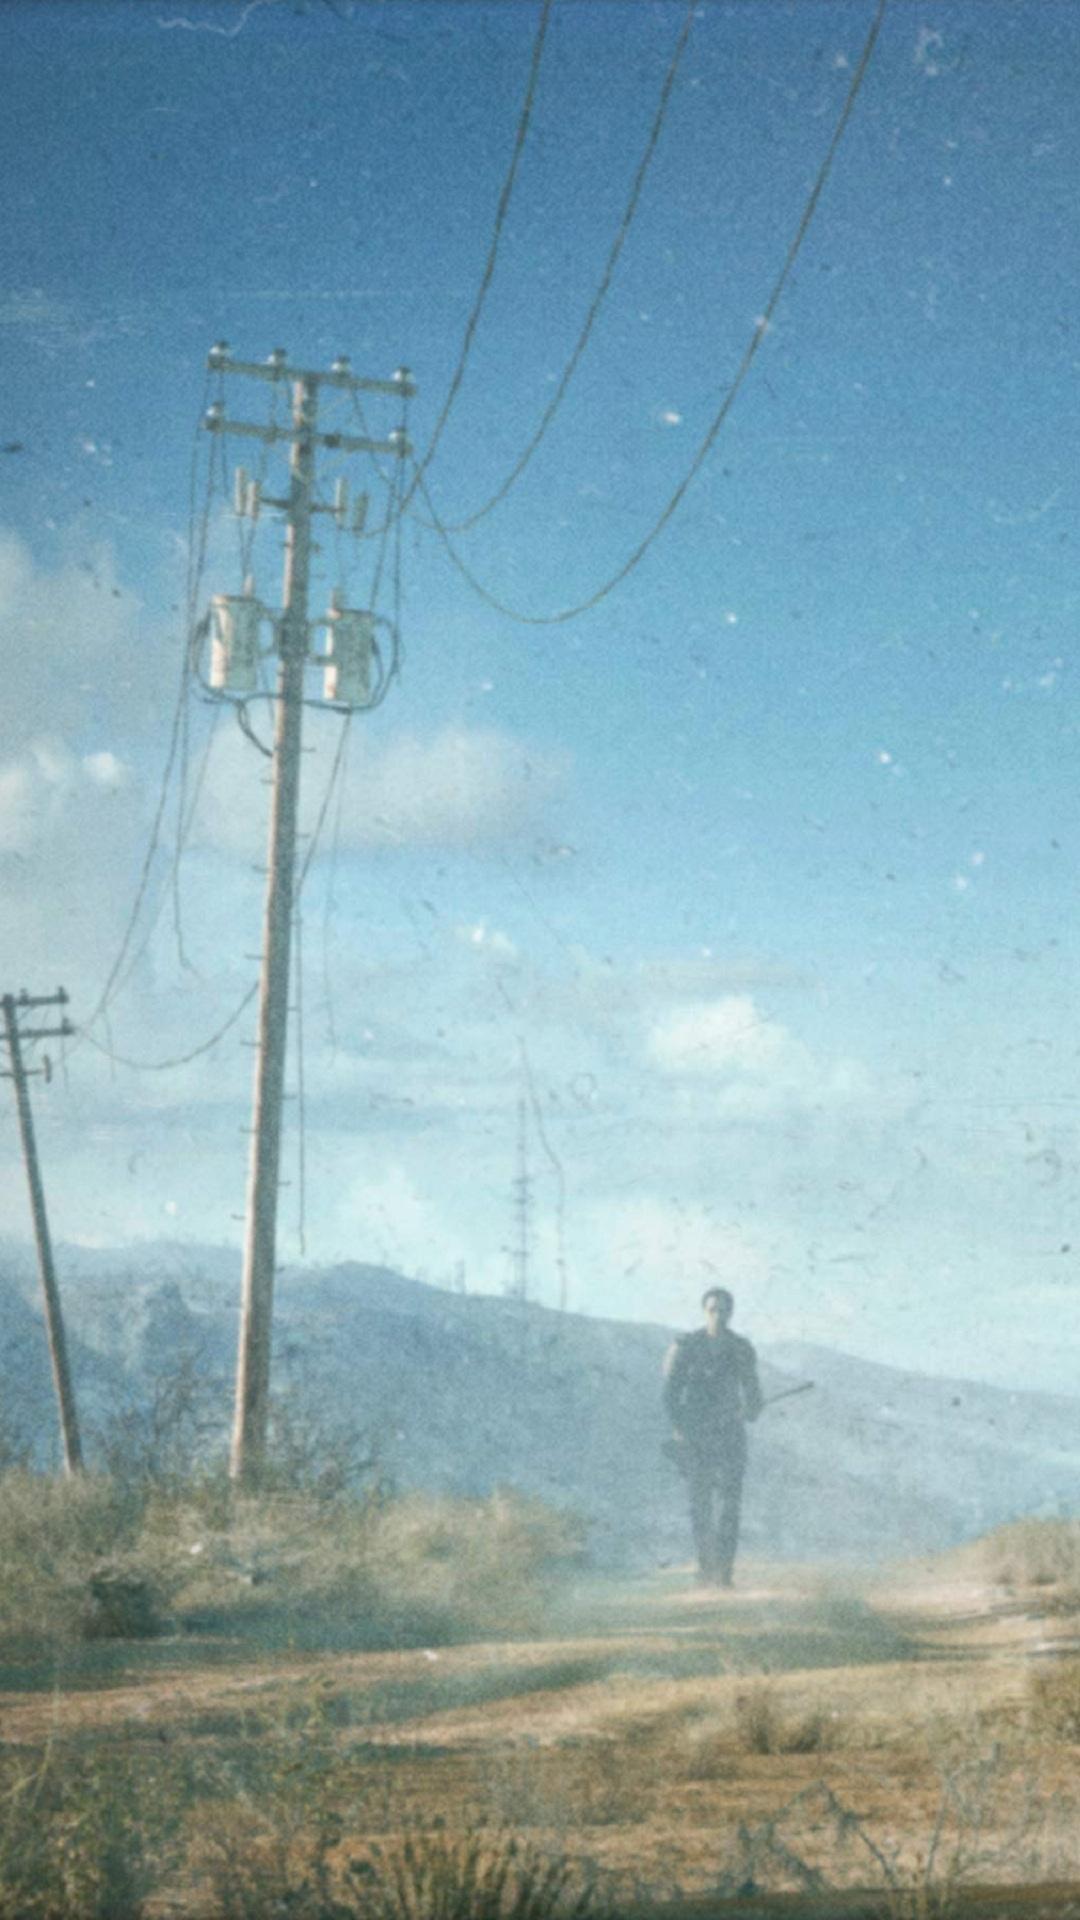 Fallout-1080×1920-Mobile-Imgur-wallpaper-wp200264